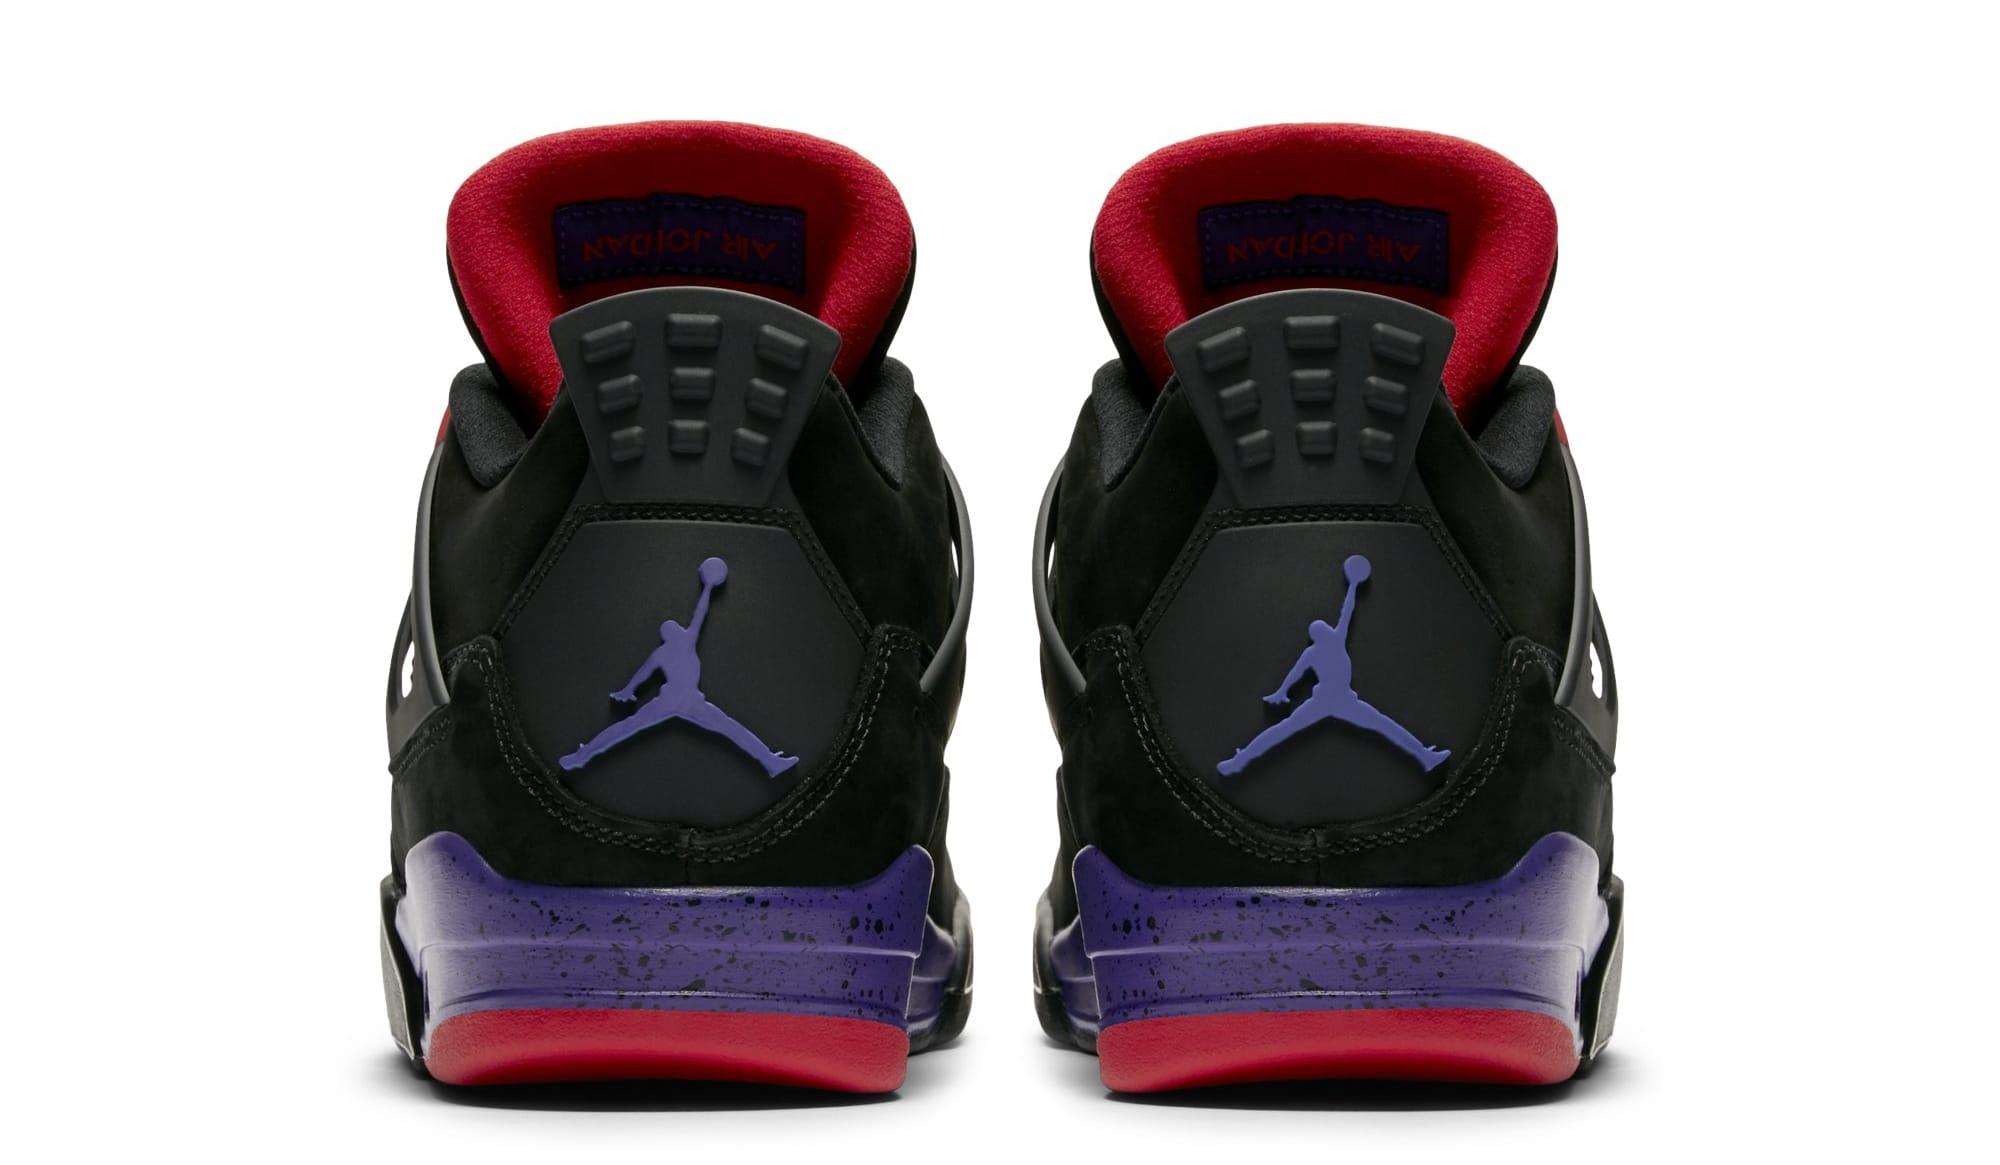 ff4a575074f Air Jordan 4 Retro NRG 'Black/University Red/Court Purple ' AQ3816-056  Release Date | Sole Collector